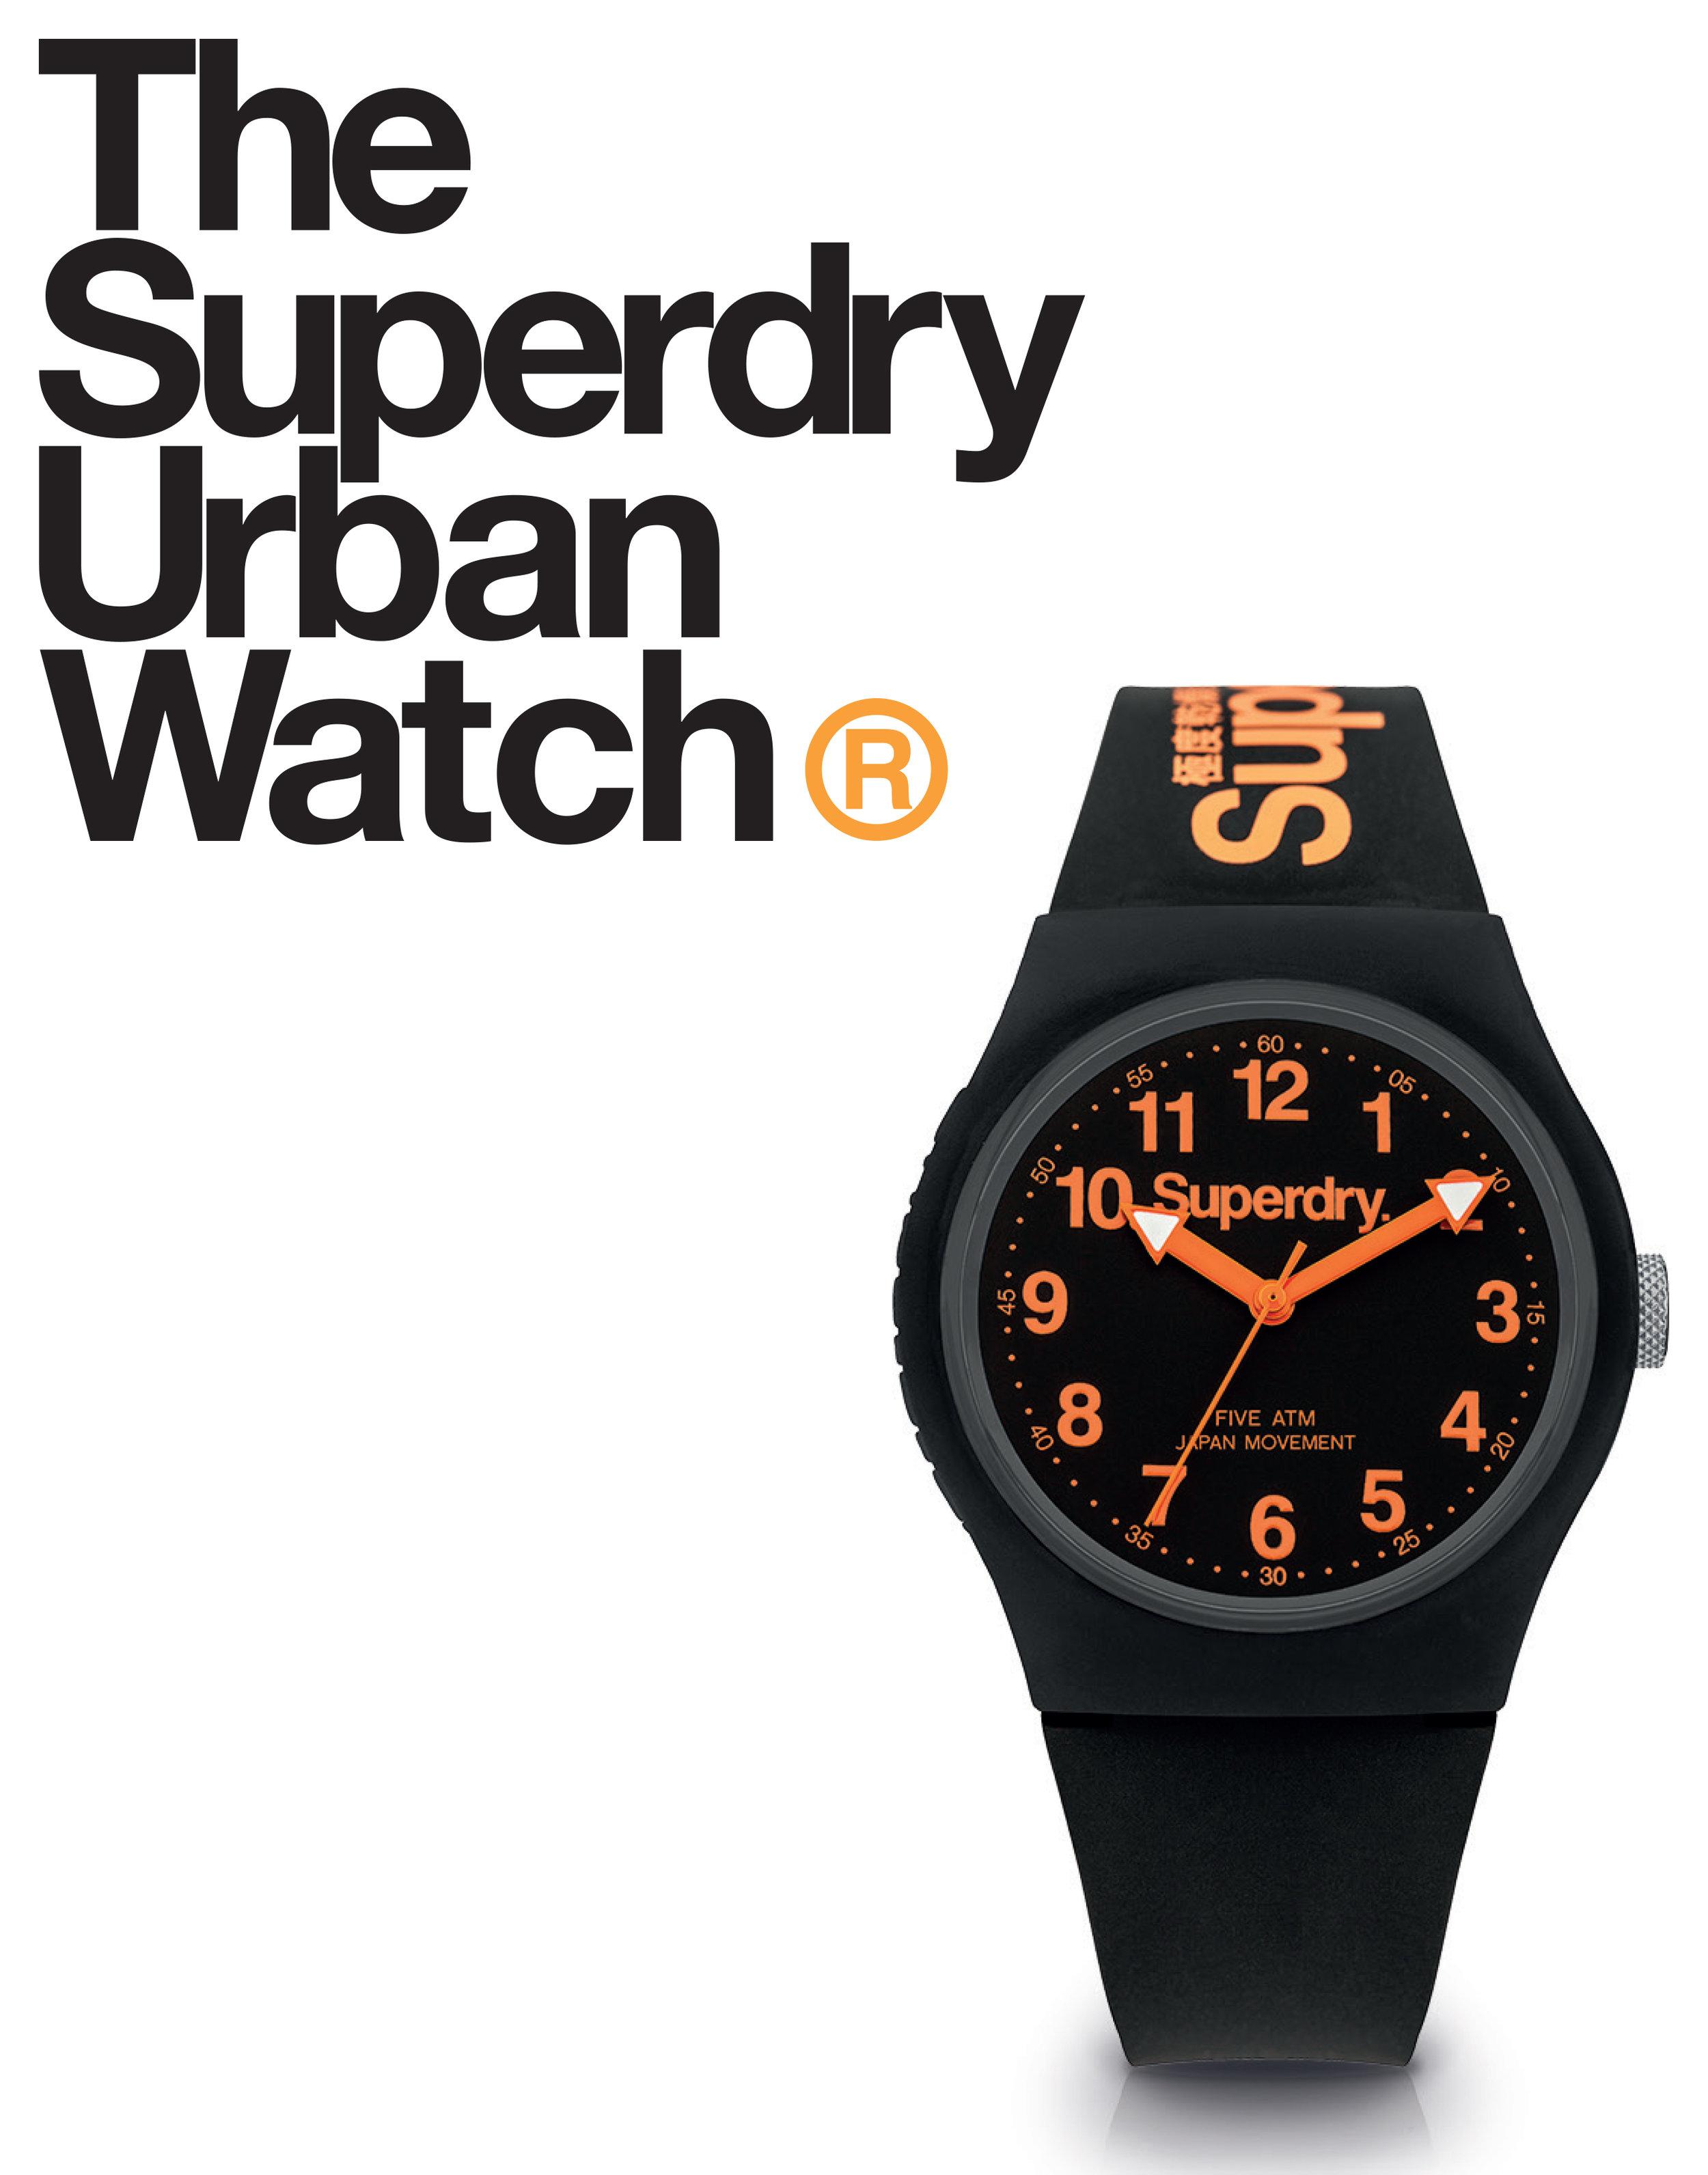 superdry-urban-watch_scorpio-worldwide_travel-retail-distributor